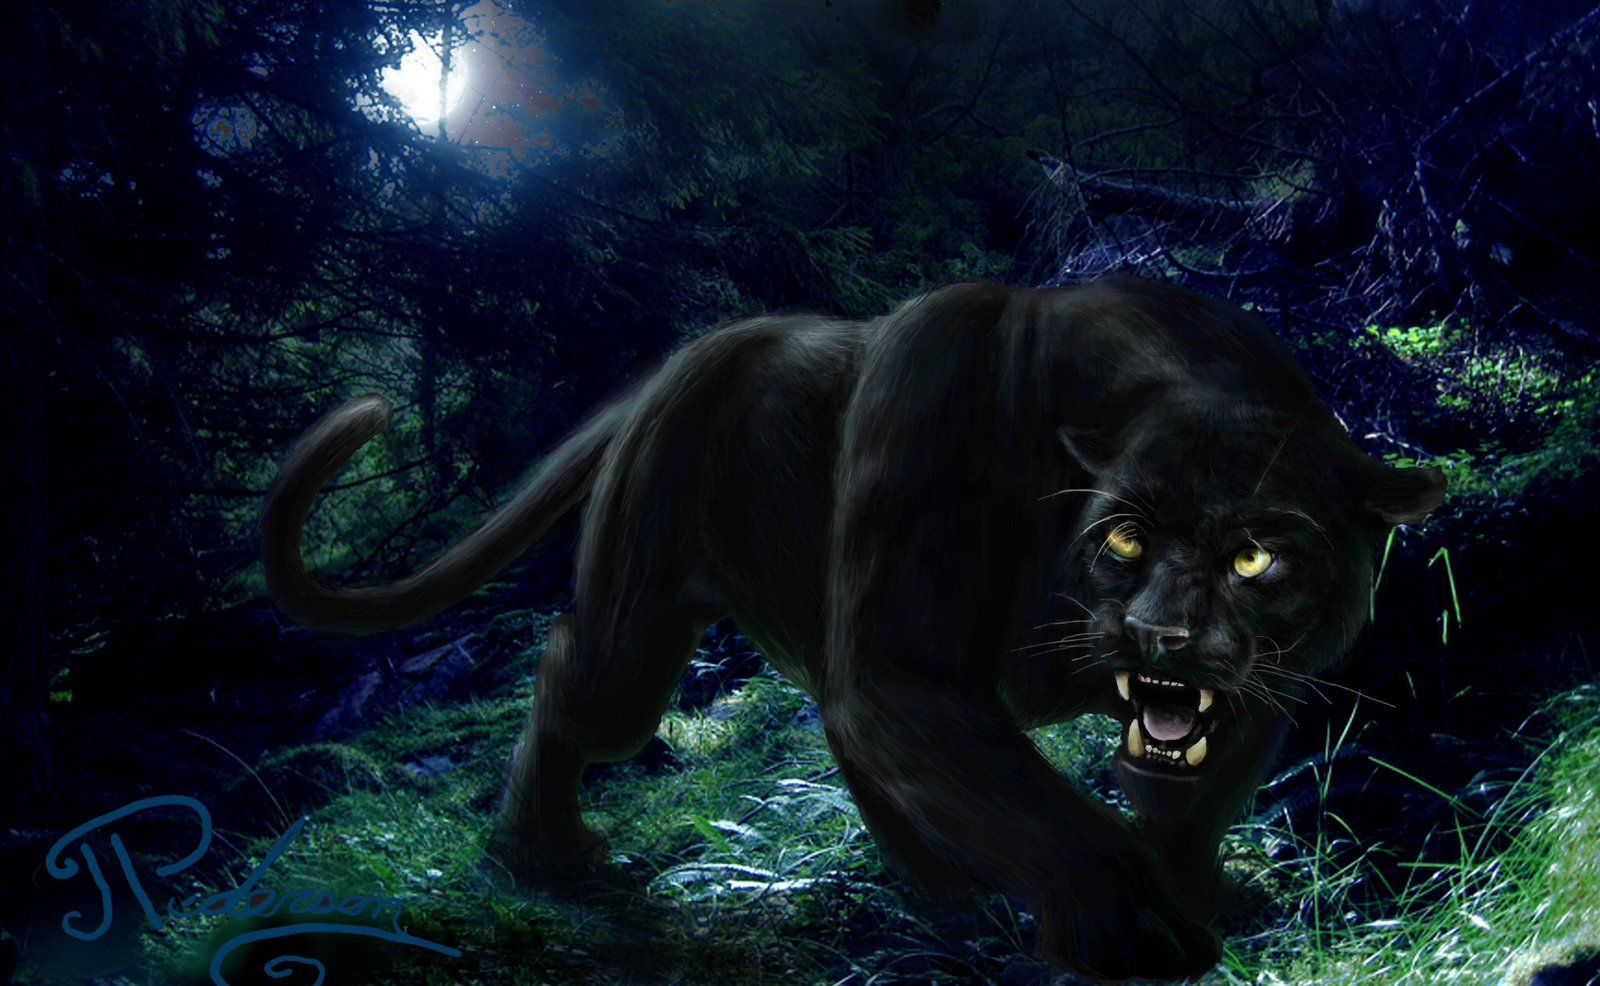 Jumping Black Panther Animal Wallpapers Top Free Jumping Black Panther Animal Backgrounds Wallpaperaccess